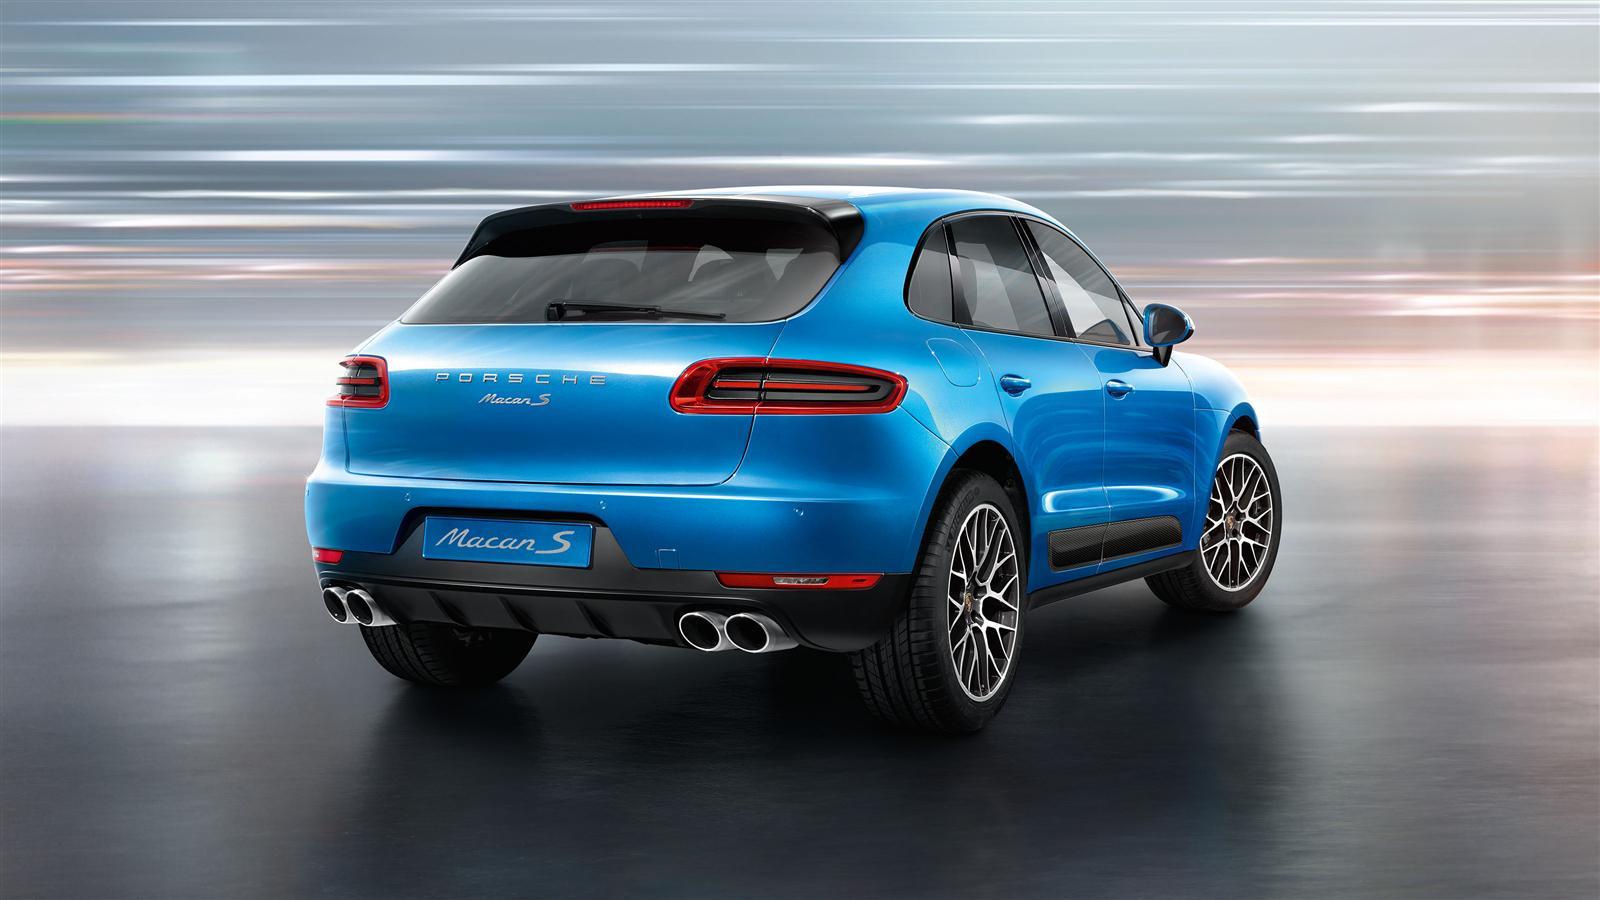 Porsche Macan S 2014 2015 2016 2017 Autoevolution